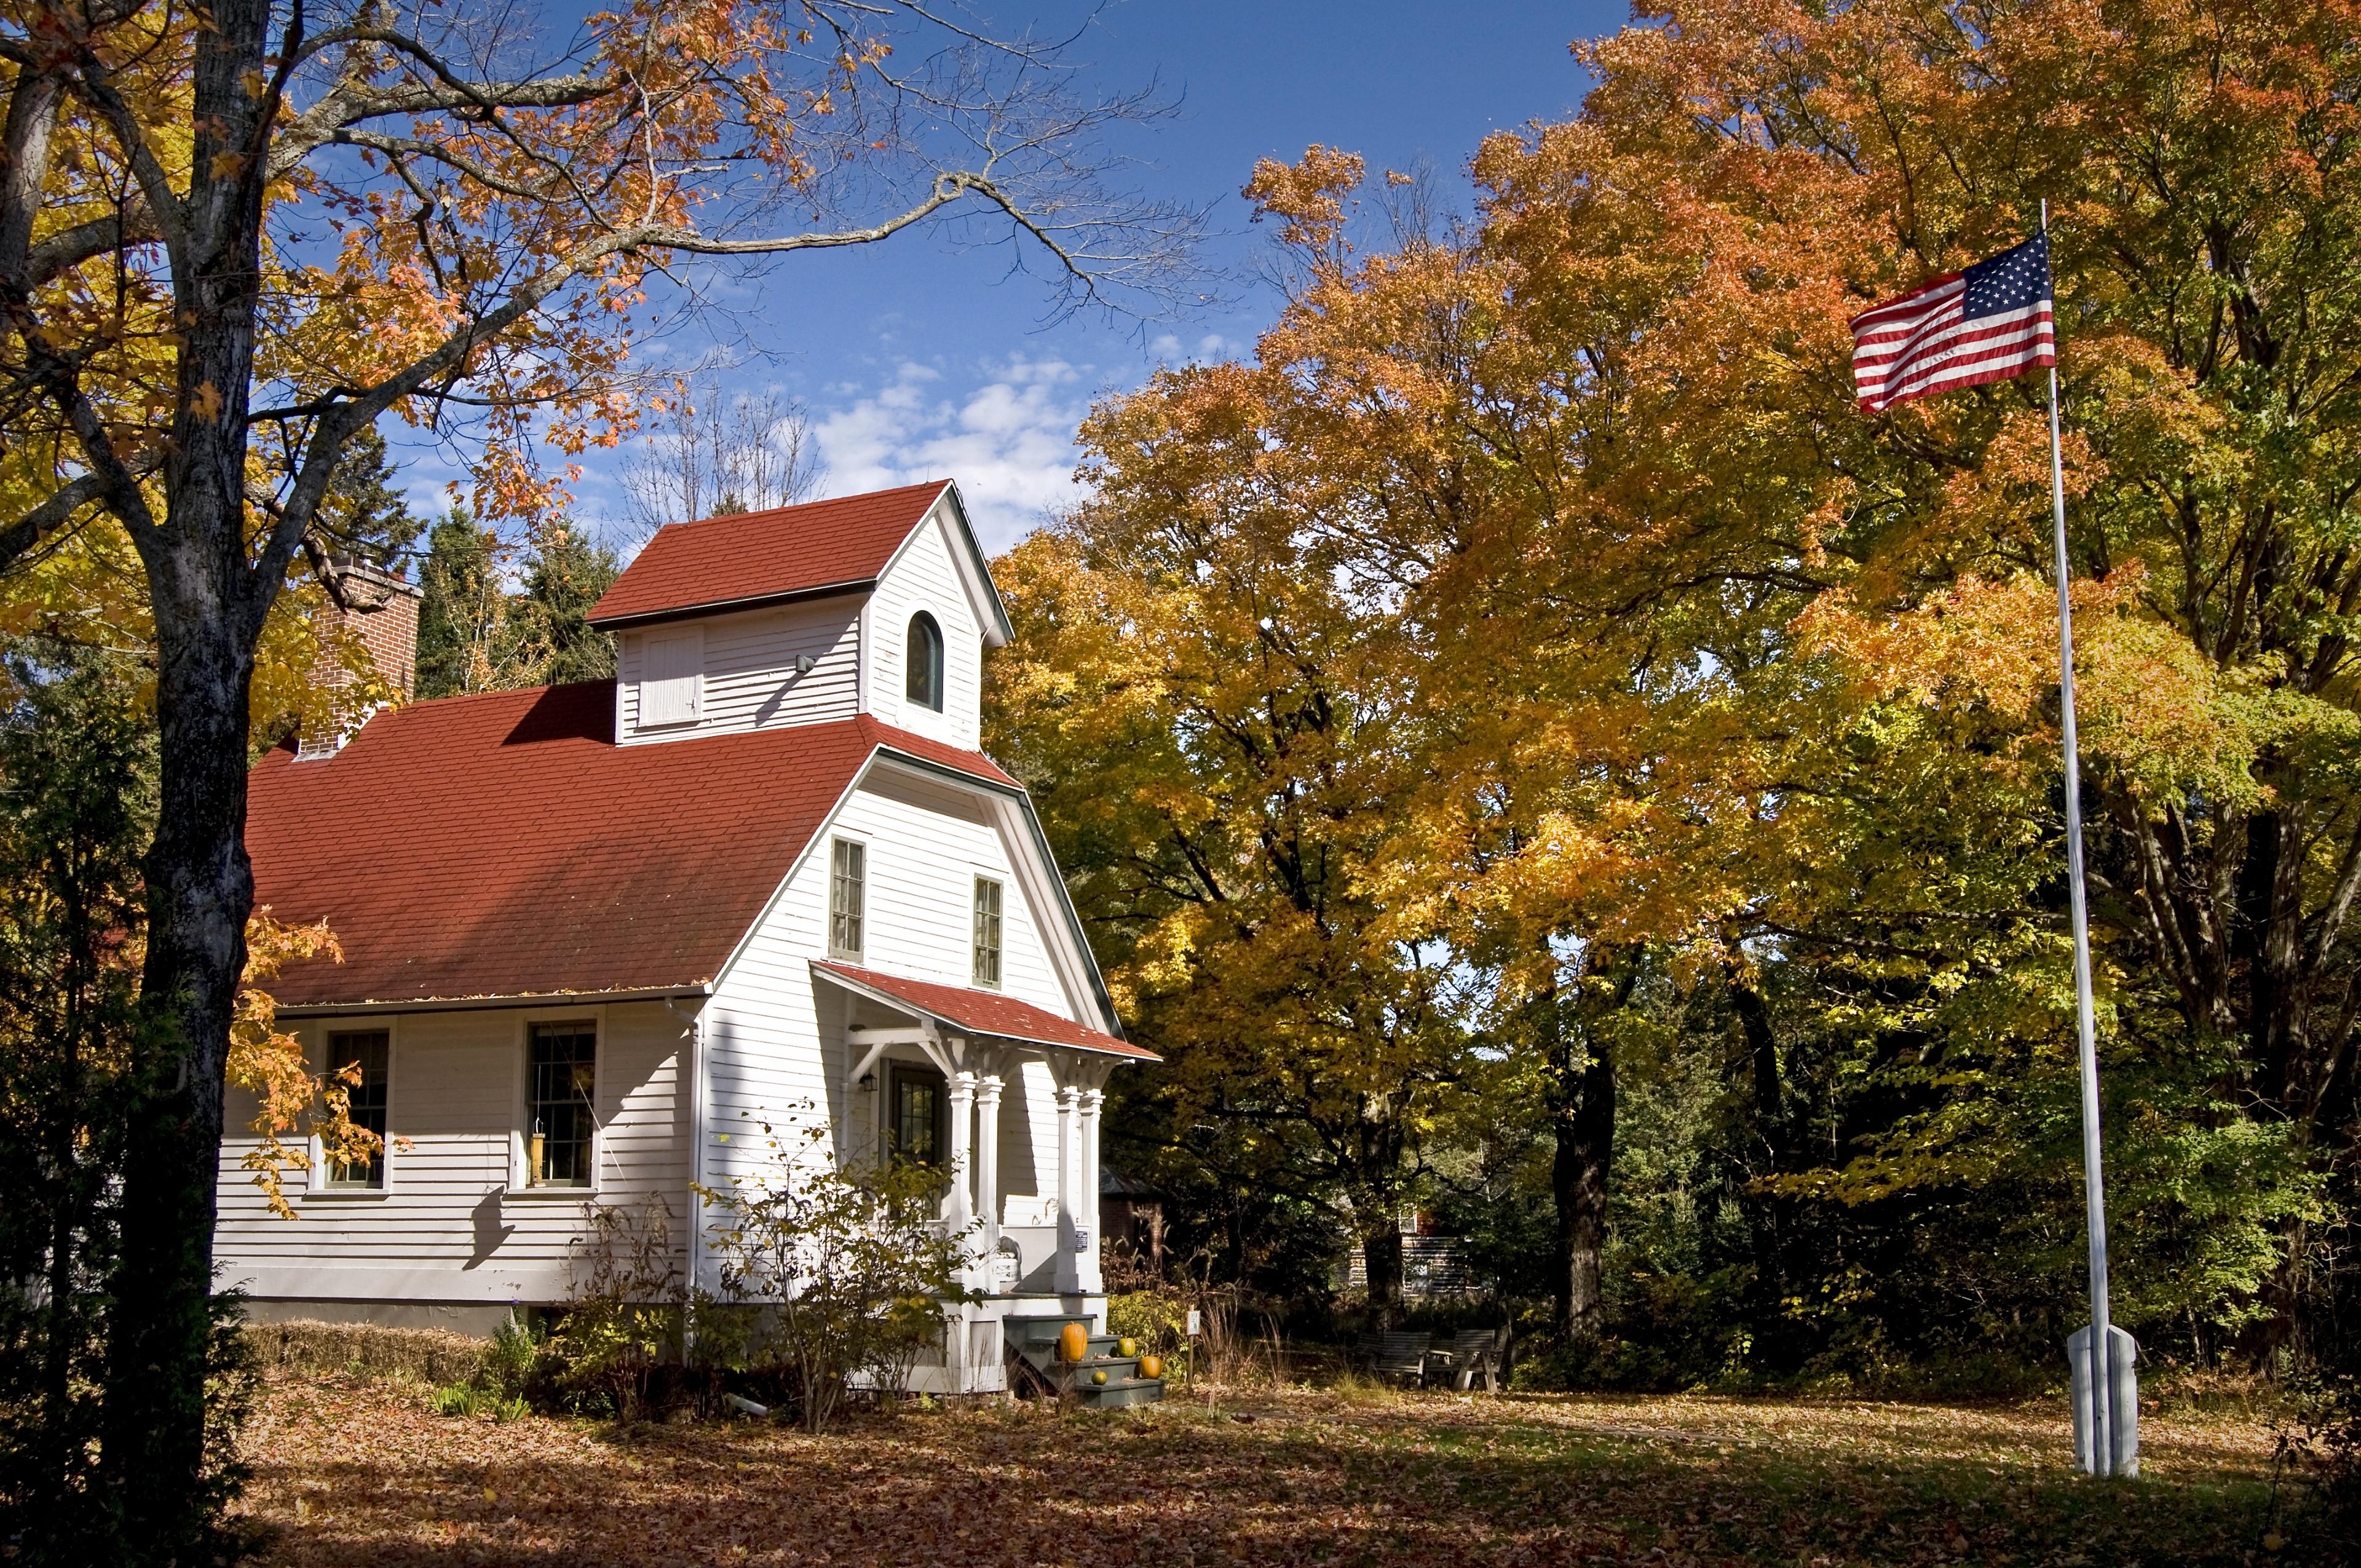 Door County, Wisconsin, United States of America